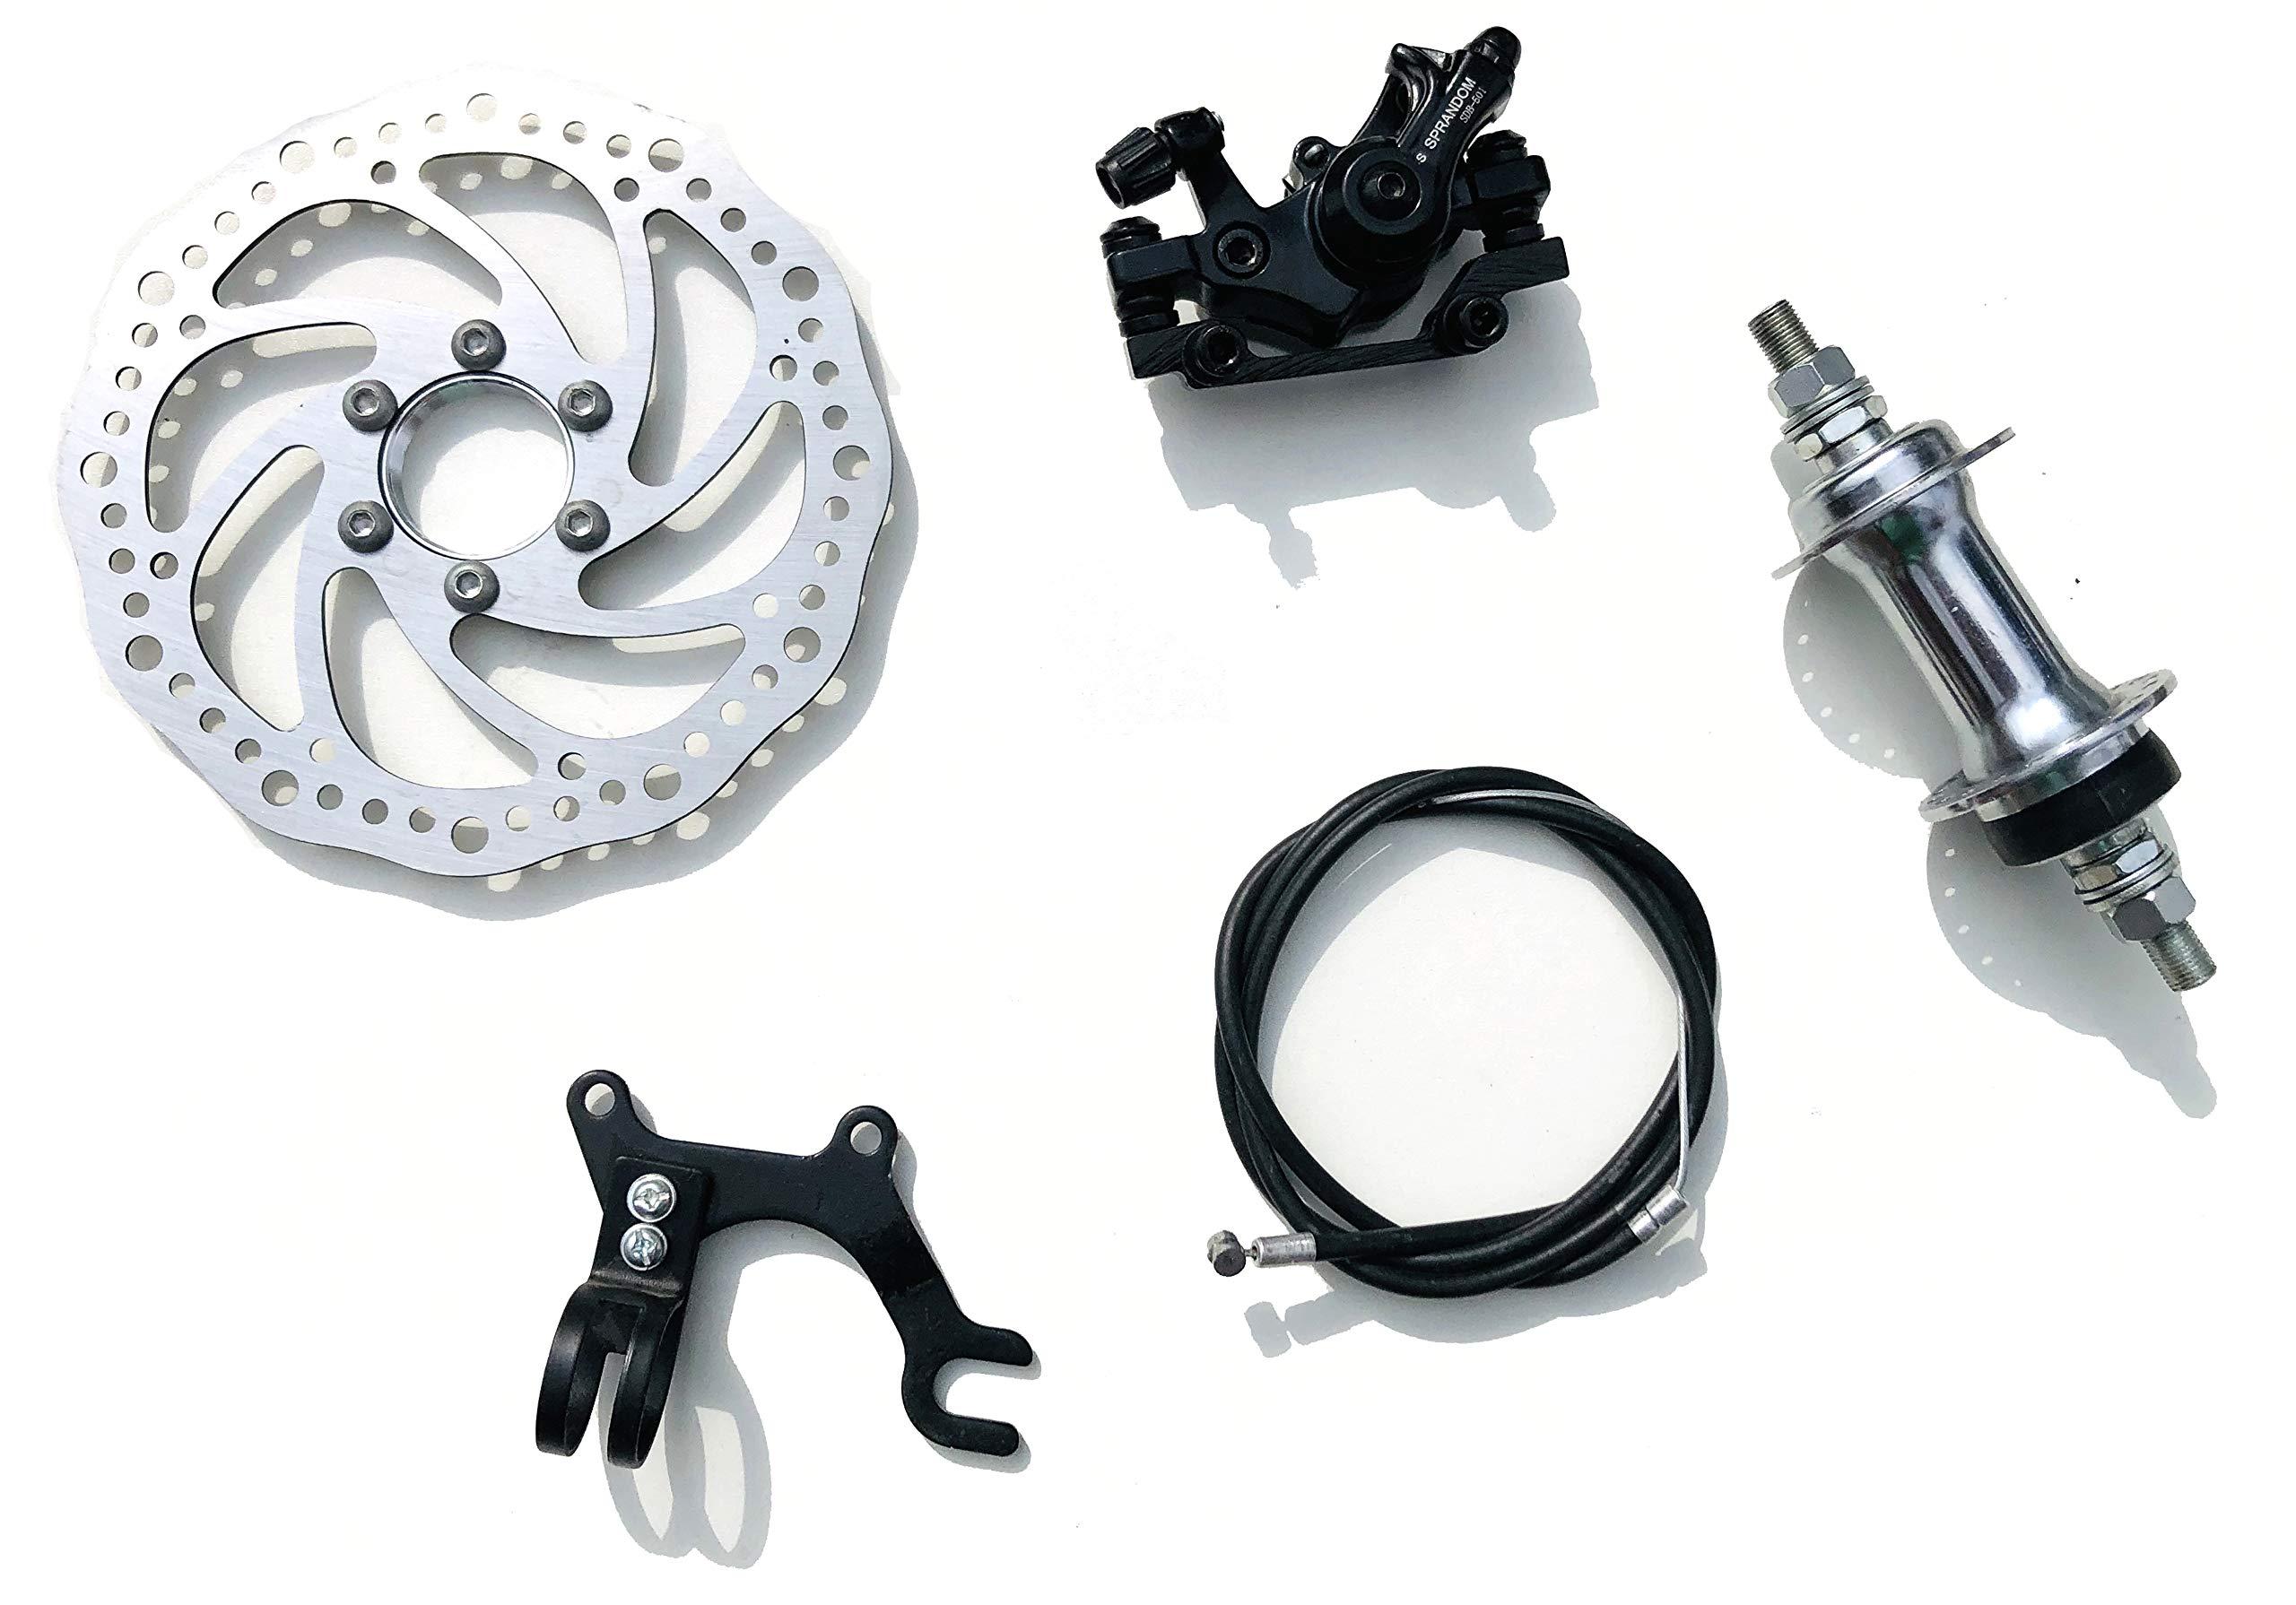 AASHOPPERS - Juego de Frenos de Disco mecánicos para Bicicleta de montaña (160 mm): Amazon.es: Deportes y aire libre